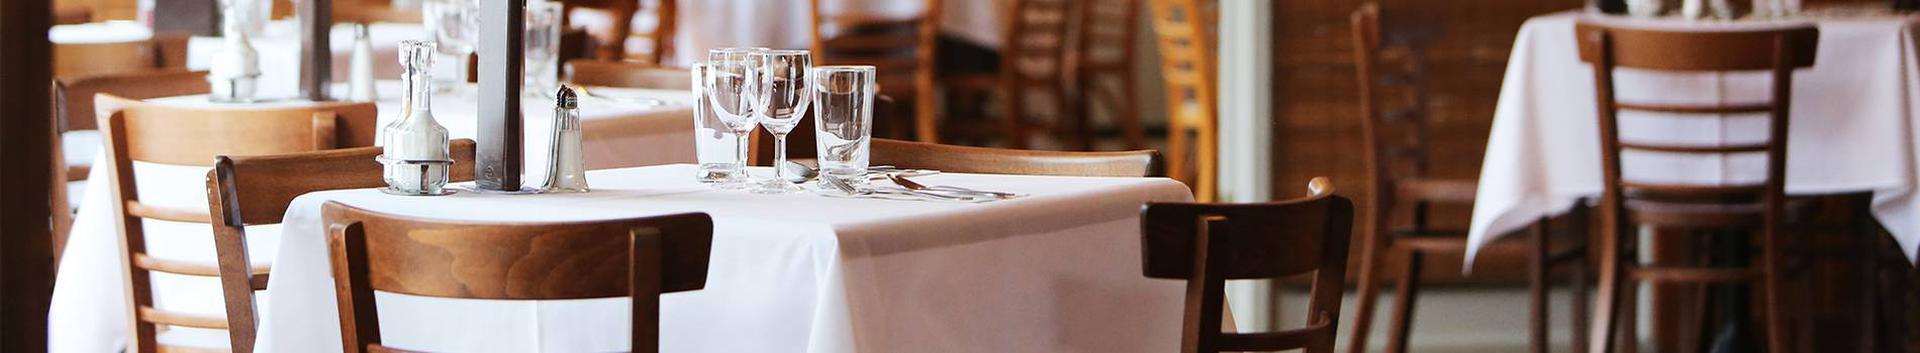 56101_toitlustus-restoran-jm-_10583184_xl.jpg